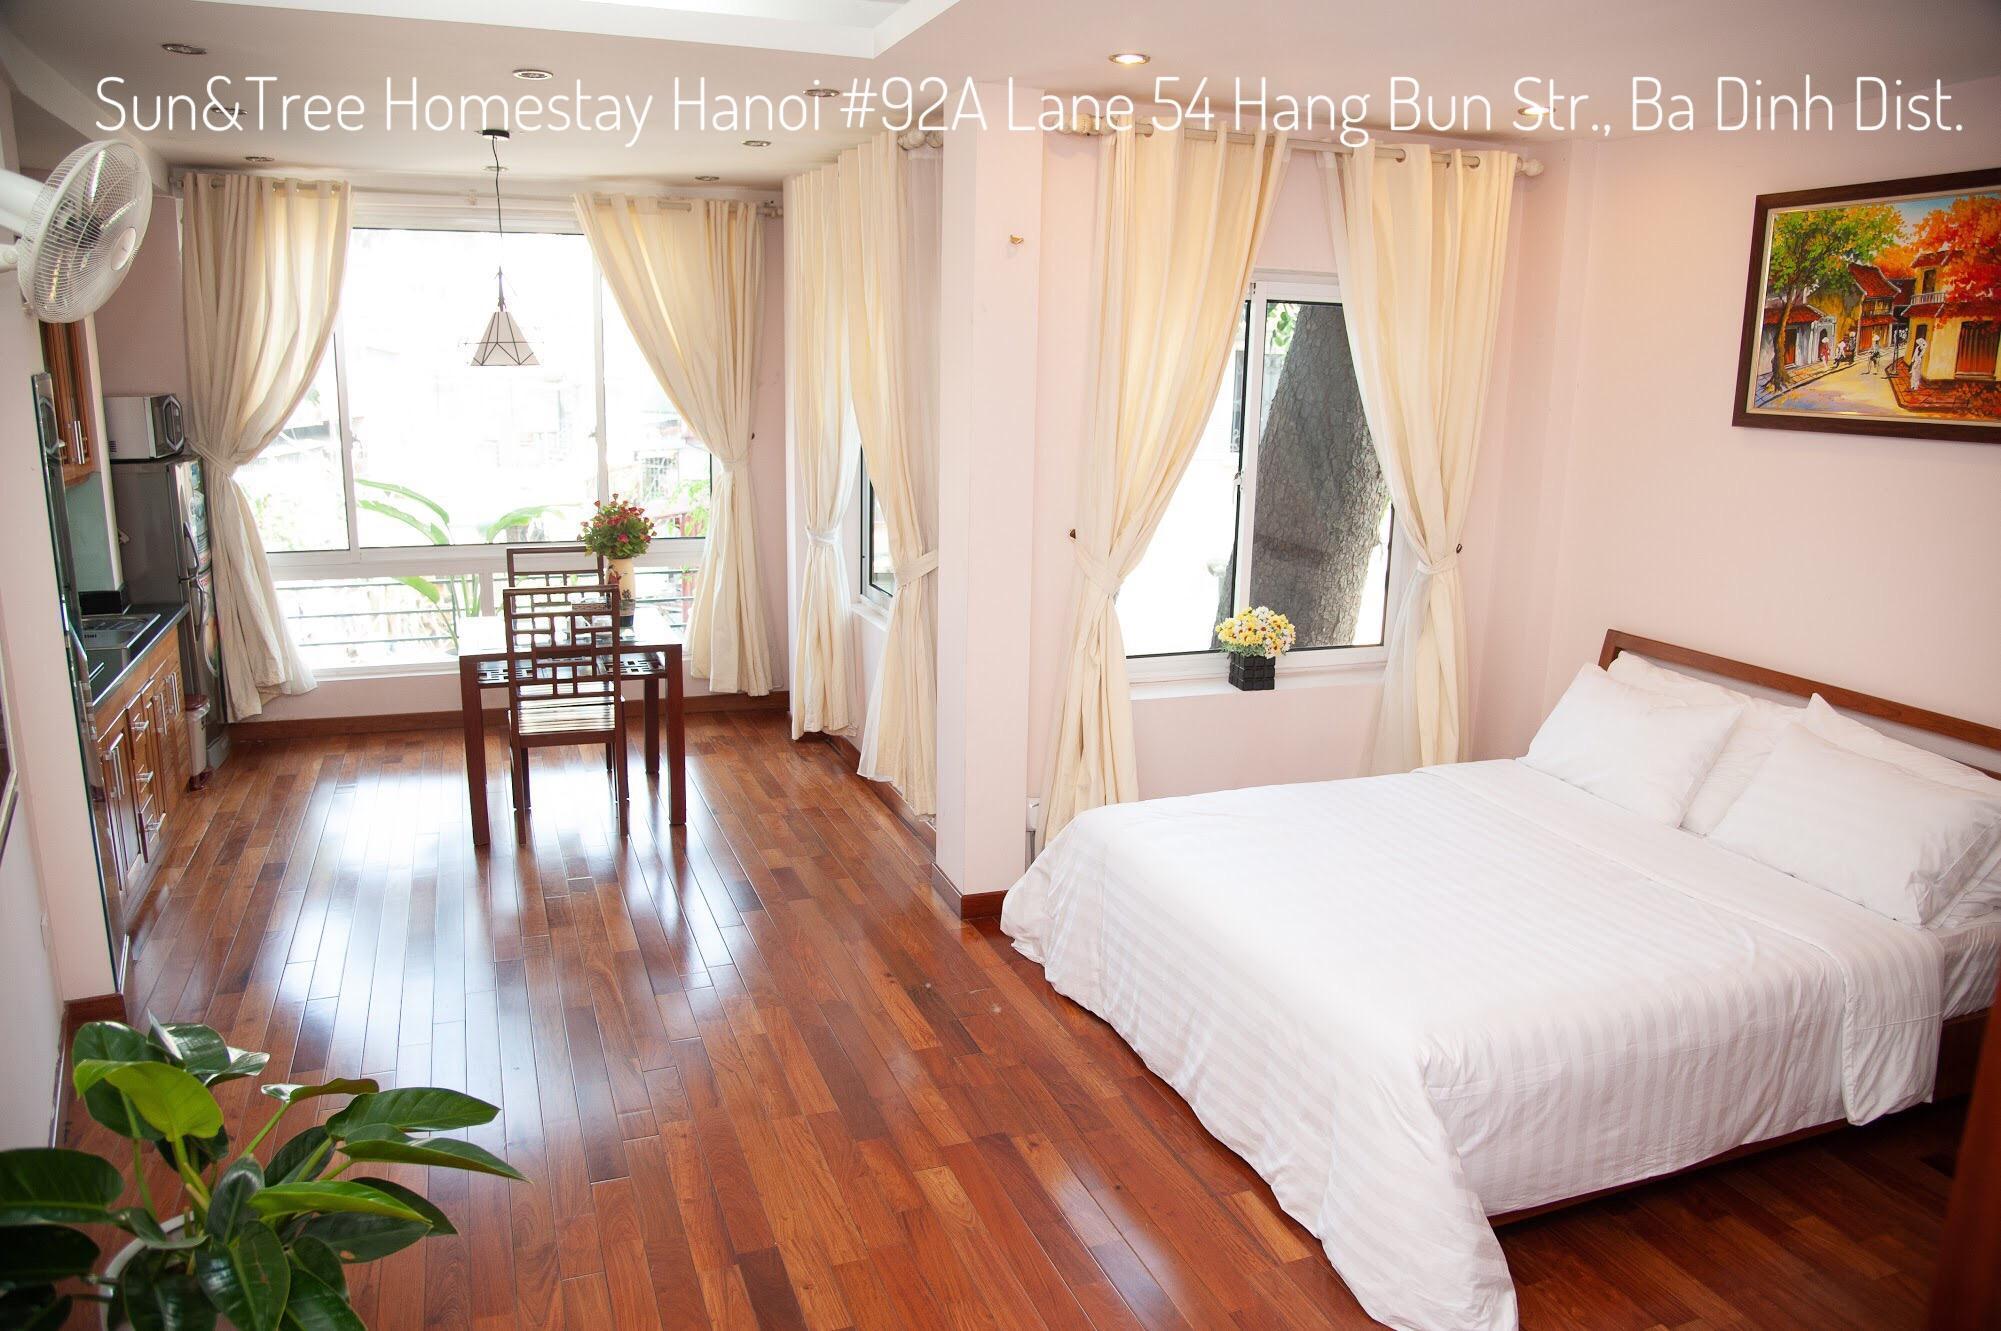 Sun&Tree Homestay Hanoi - Deluxe room 1